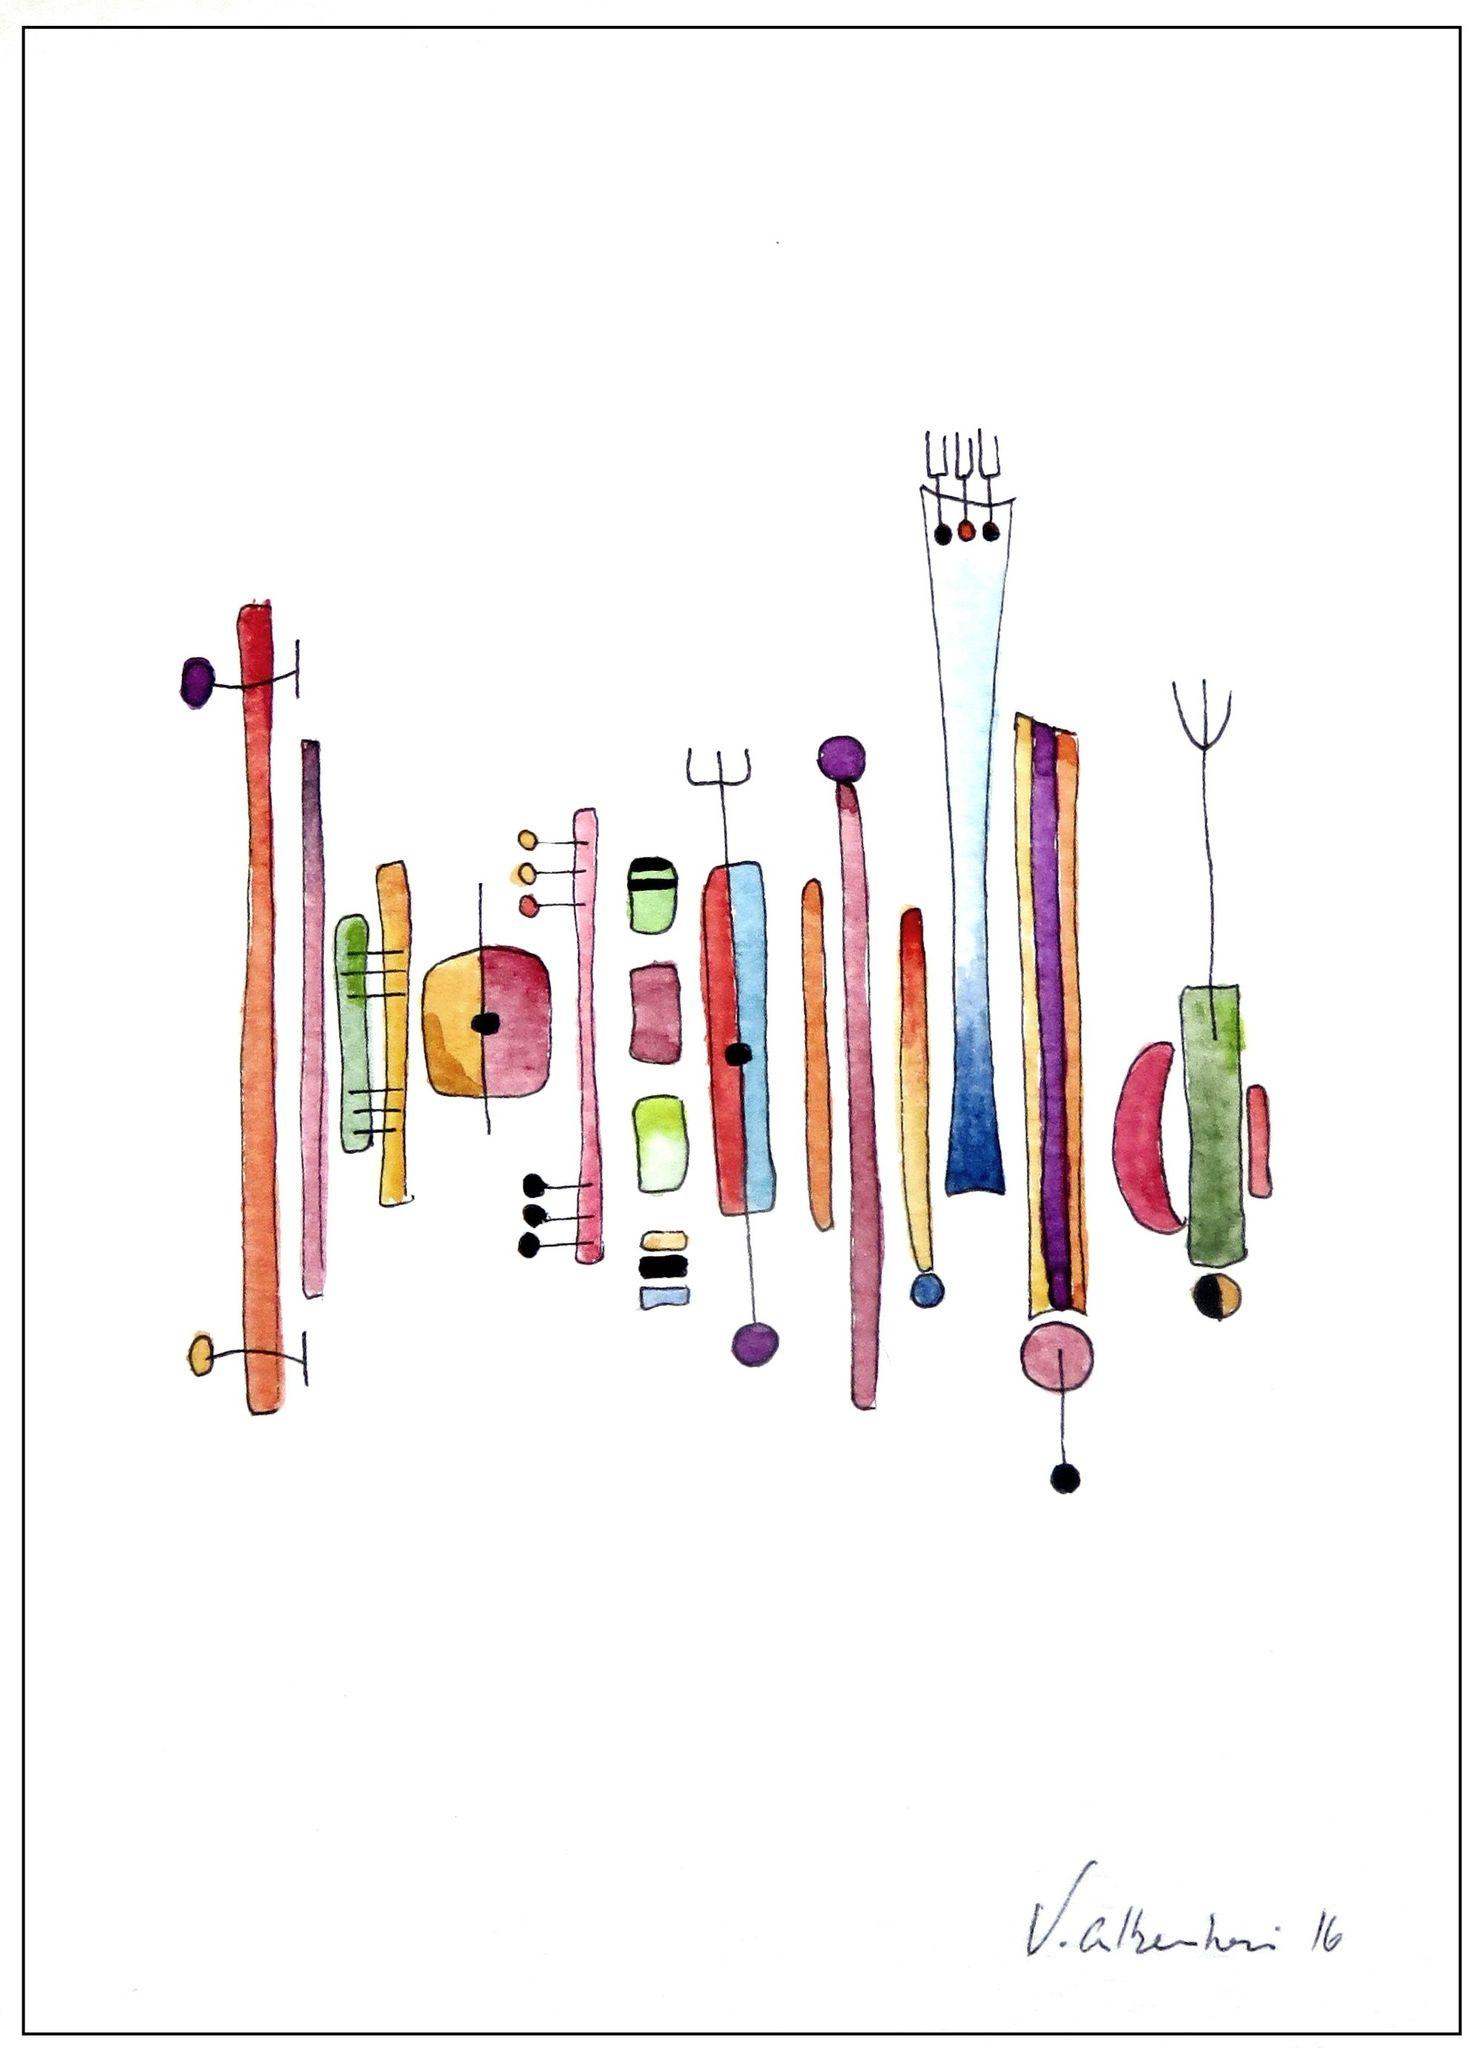 belle aquarelle abstraite couleur valerie albertosi geometrie peiture lignes (avec images ...